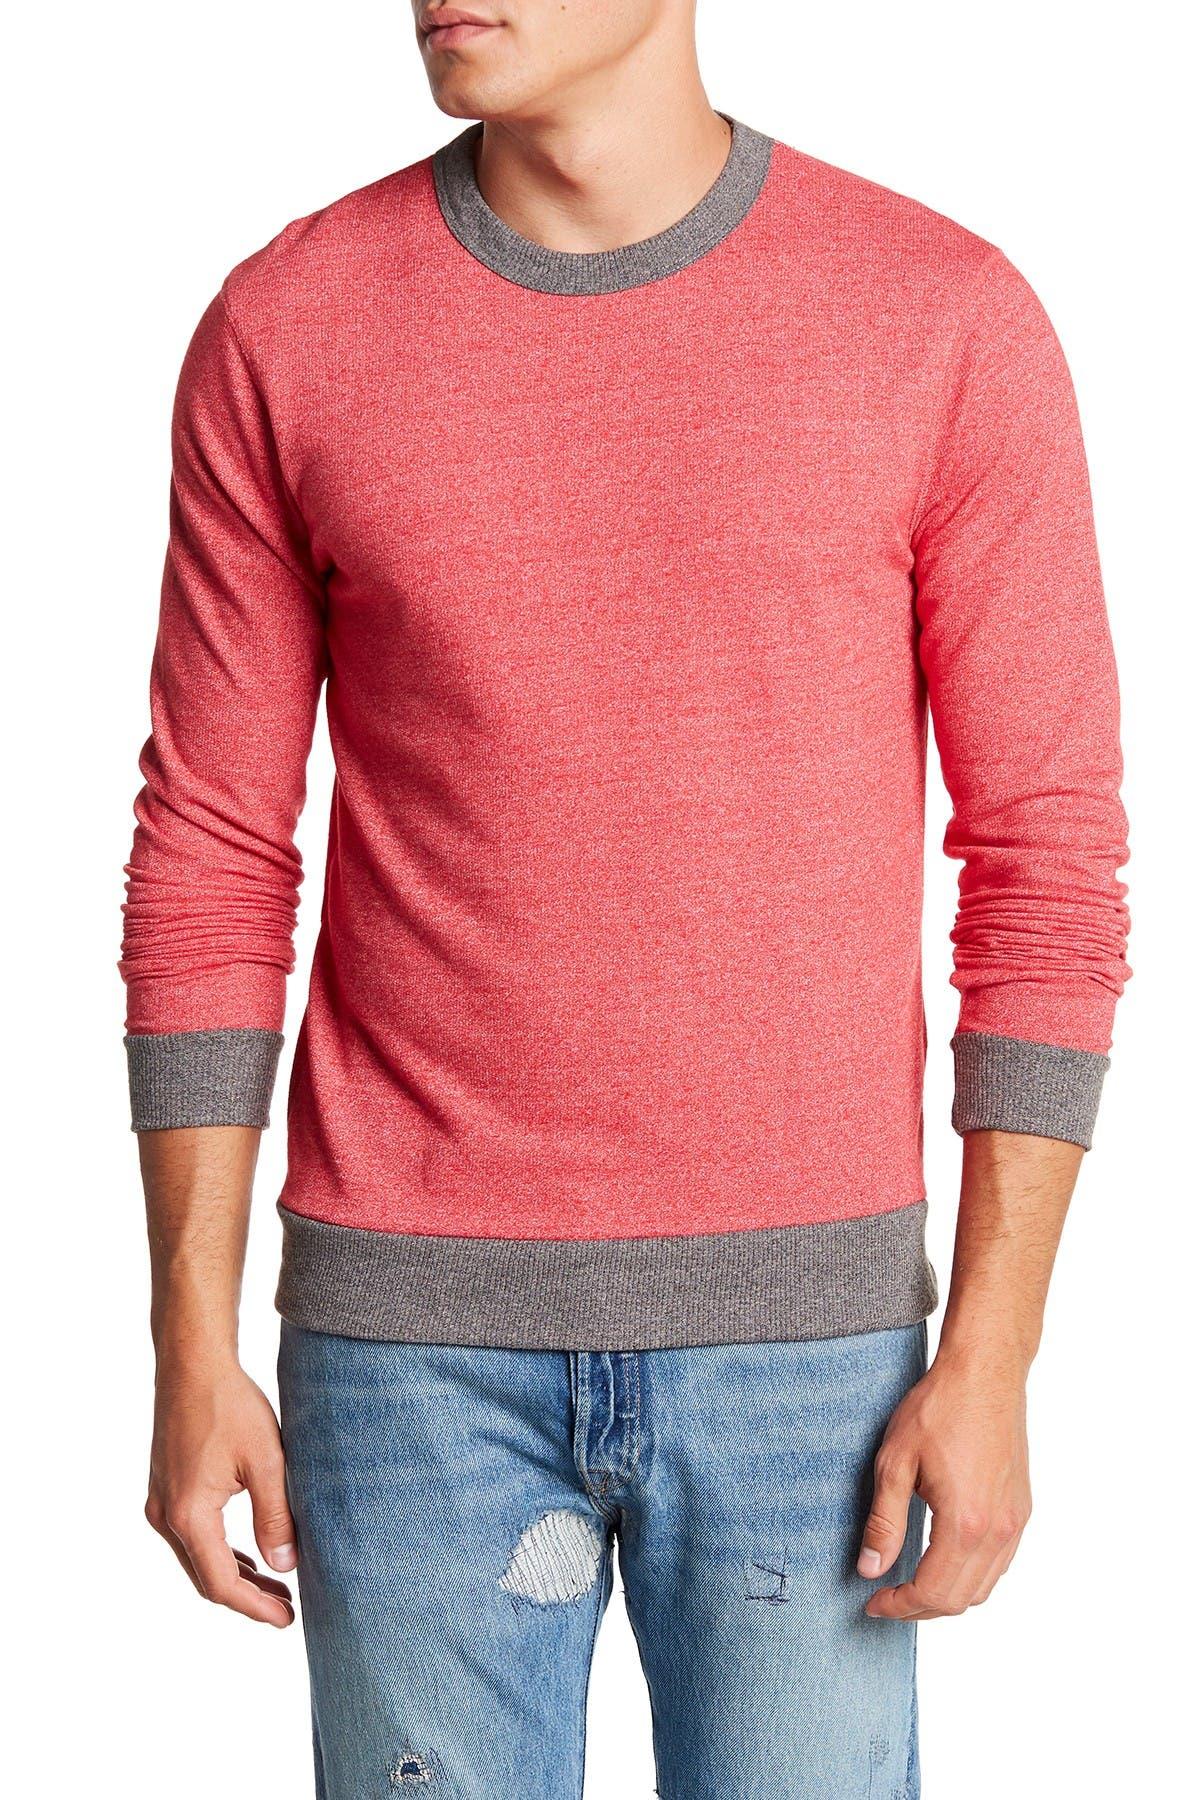 Image of Alternative Ringer Champ Pullover Sweatshirt